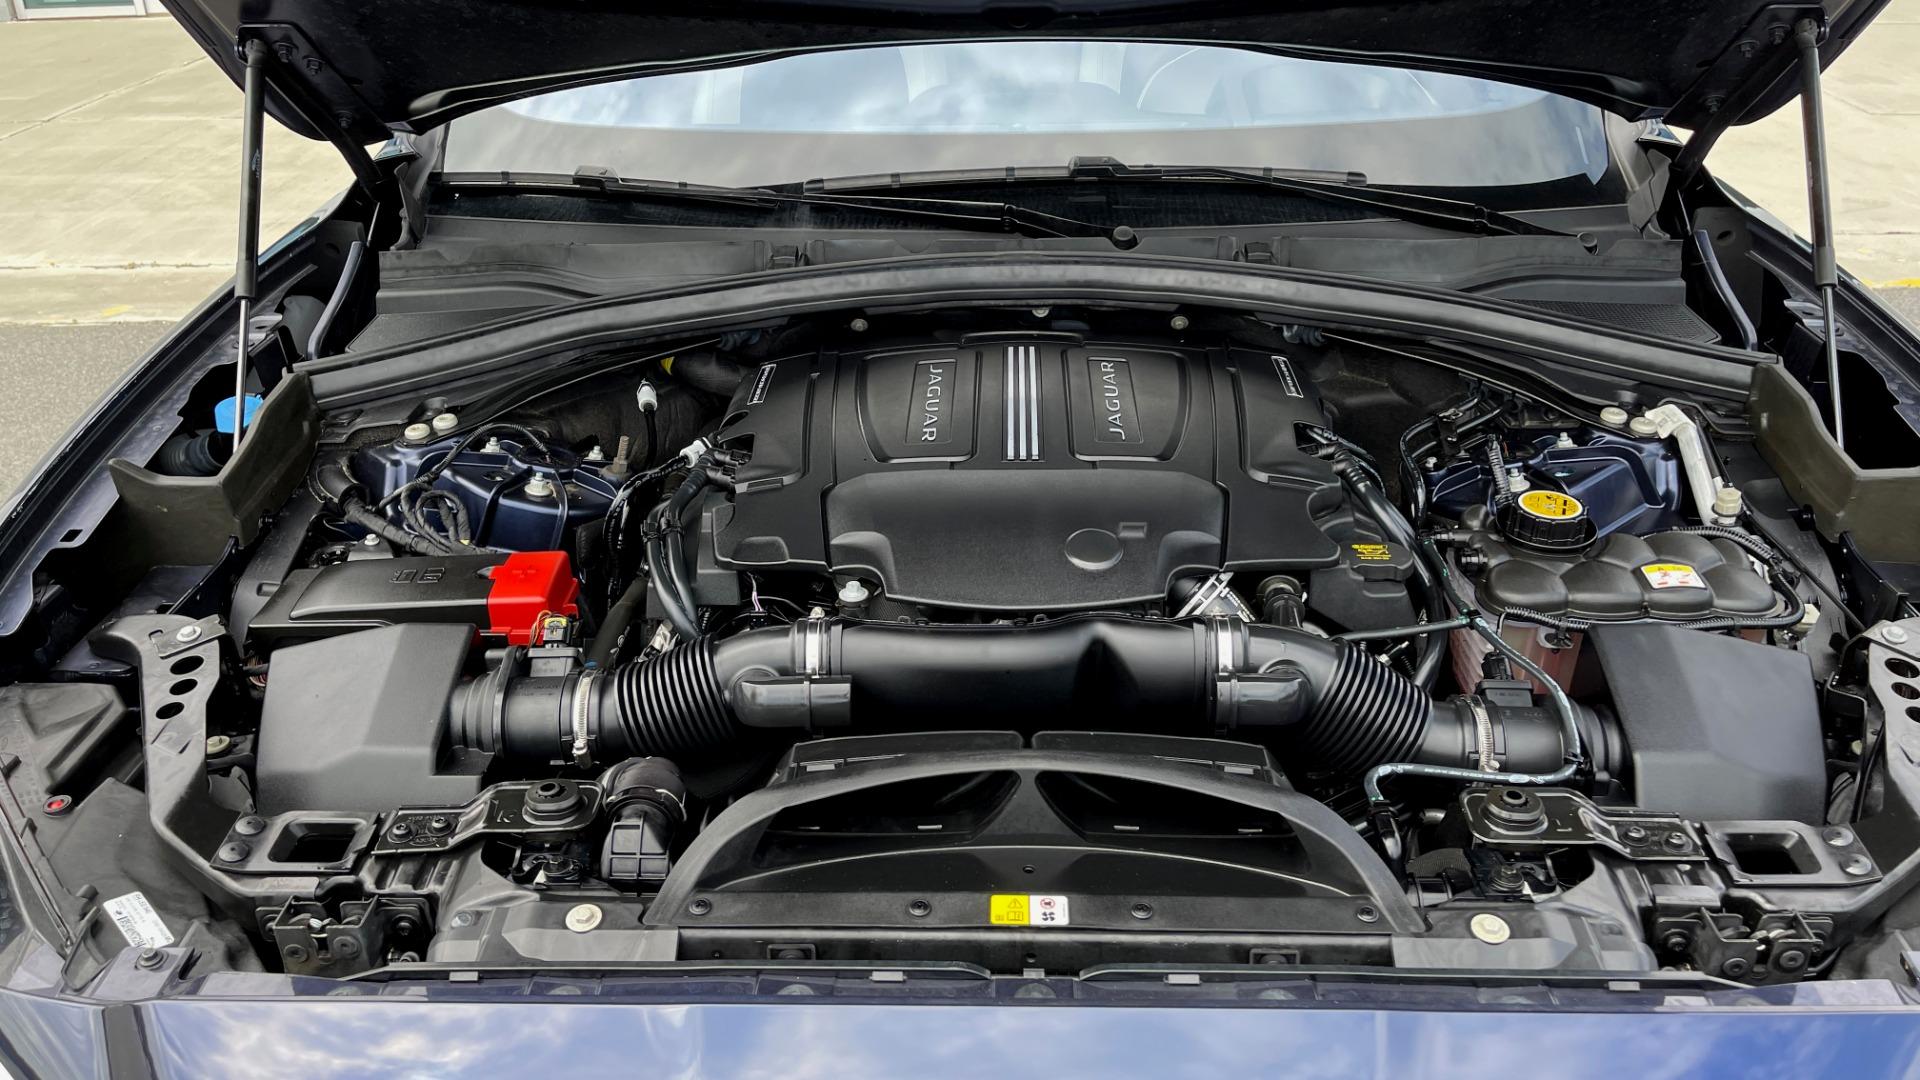 Used 2019 Jaguar F-PACE S / DRIVE PKG / BSA / HUD / BLACK EXT PKG / REARVIEW for sale $50,995 at Formula Imports in Charlotte NC 28227 8